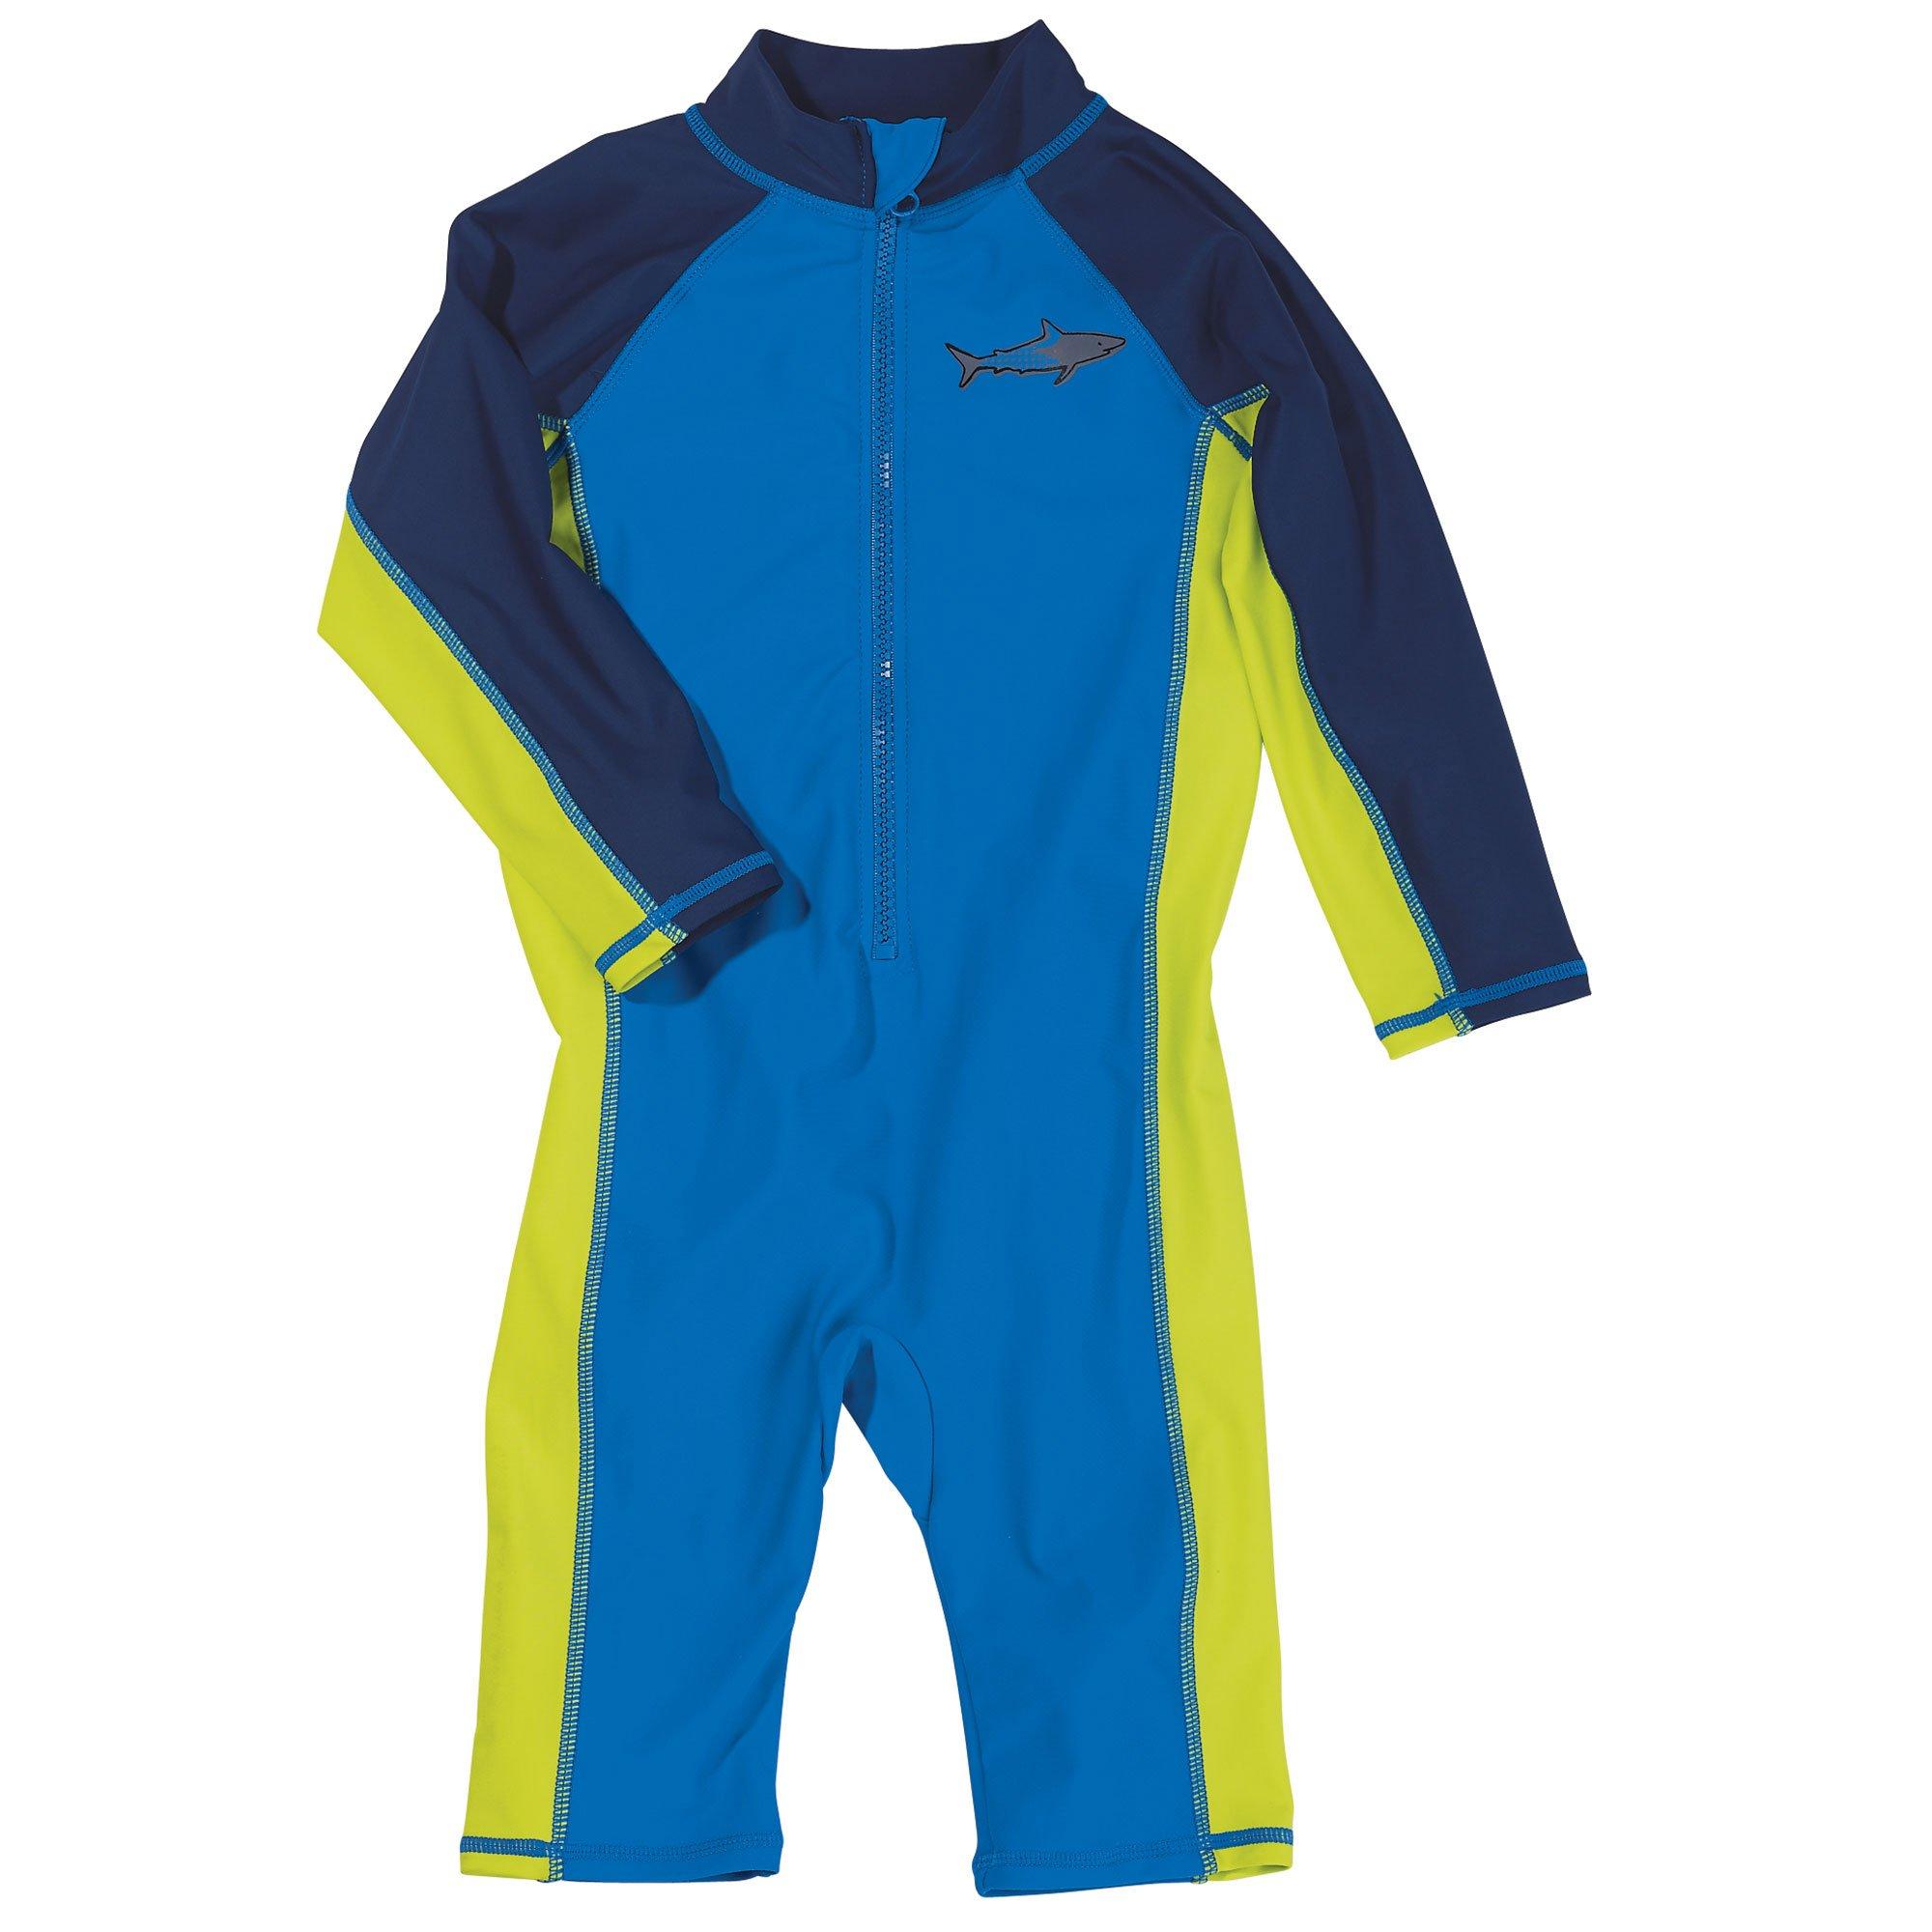 Sun Smarties Toddler Boys UPF 50+ Sun Protection Shark Surf Suit Sunsuit 4T Blue